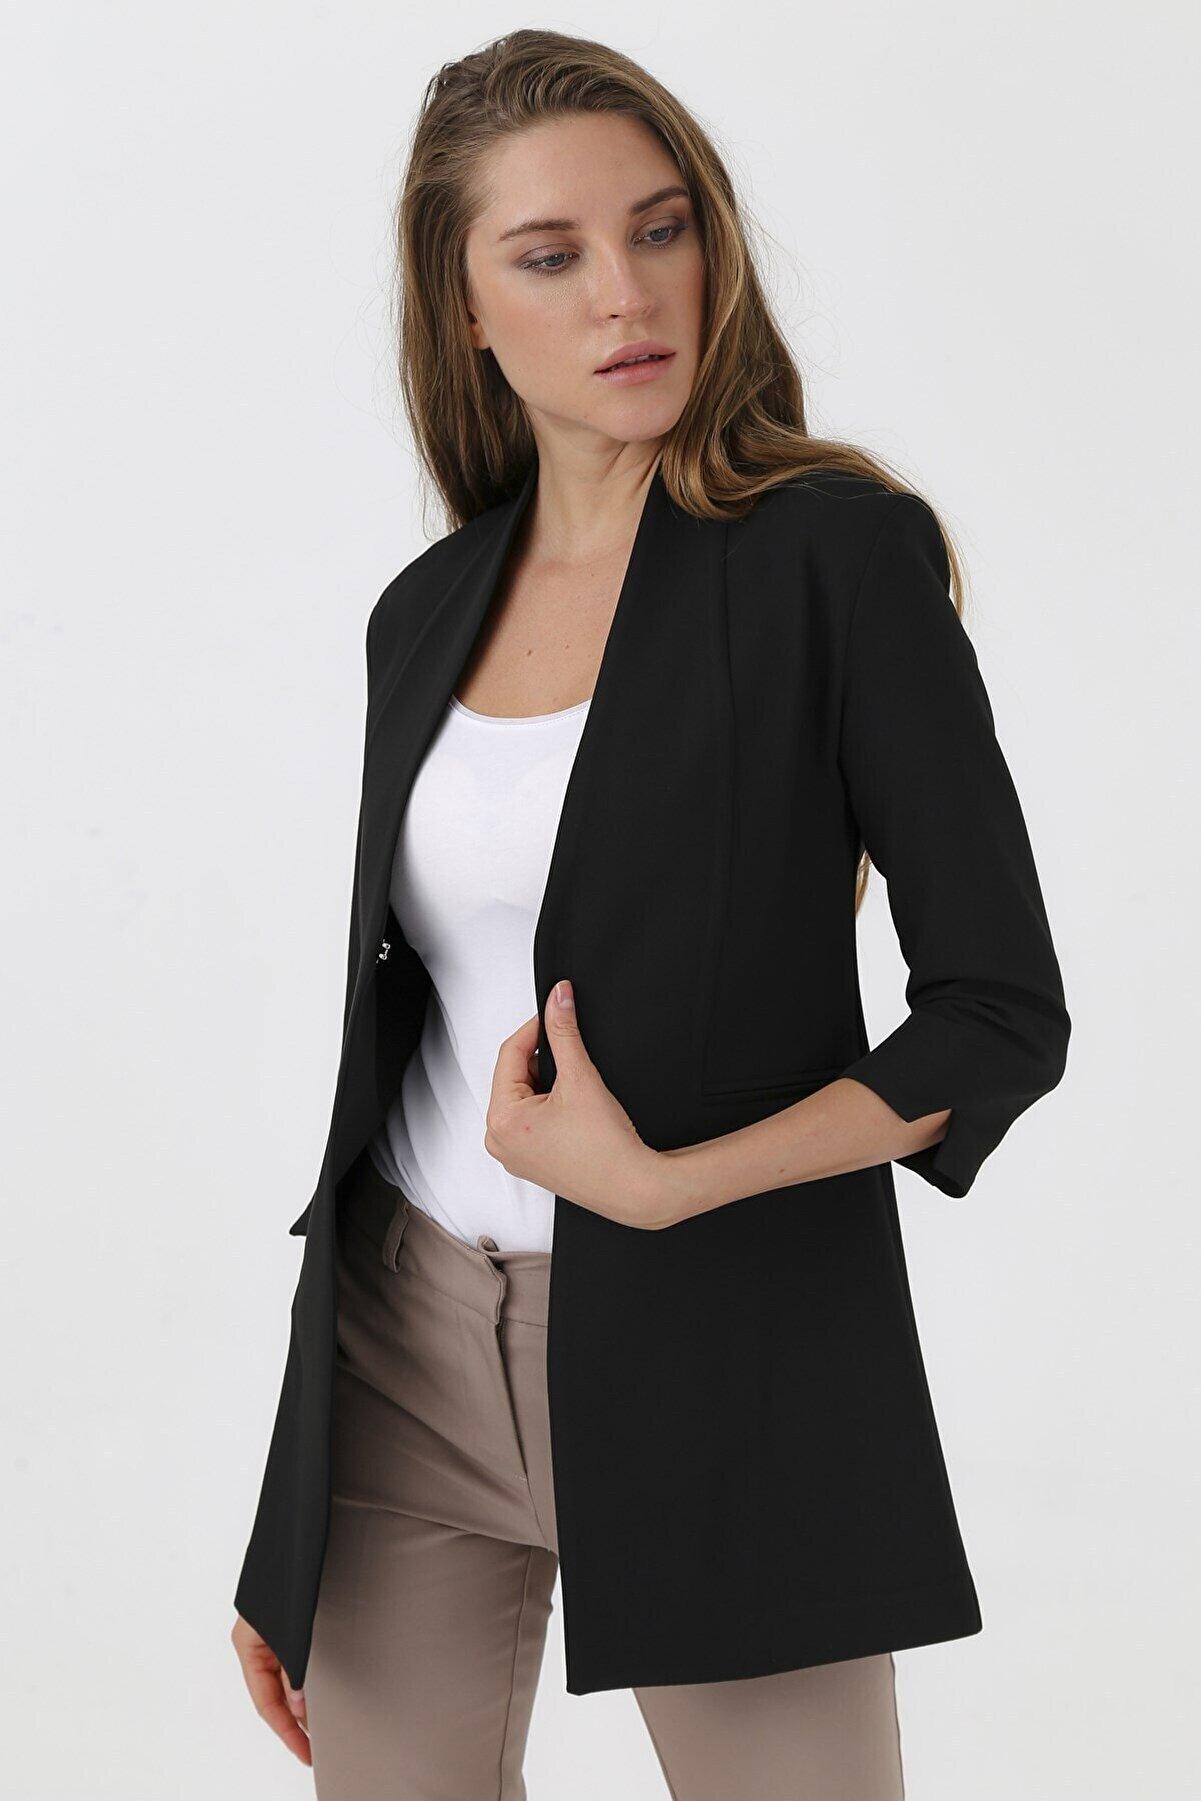 Jument Hakim Yaka Flato Cepli Kolu Yırtmaçlı Uzun Blazer Kumaş Ceket-siyah